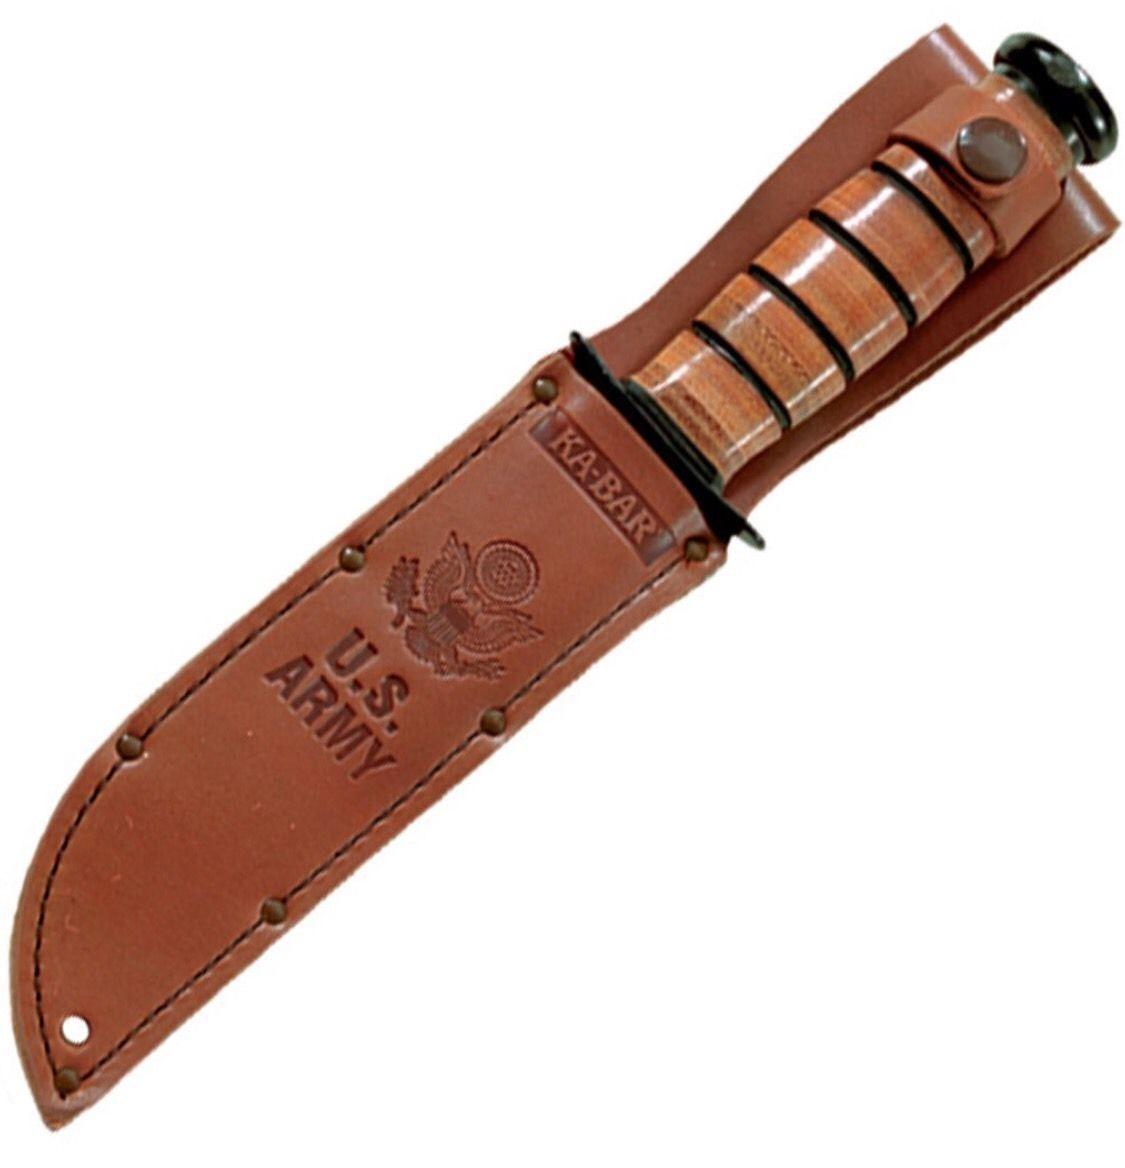 Ka Bar Us Military Fighting Utility Knife Us Army